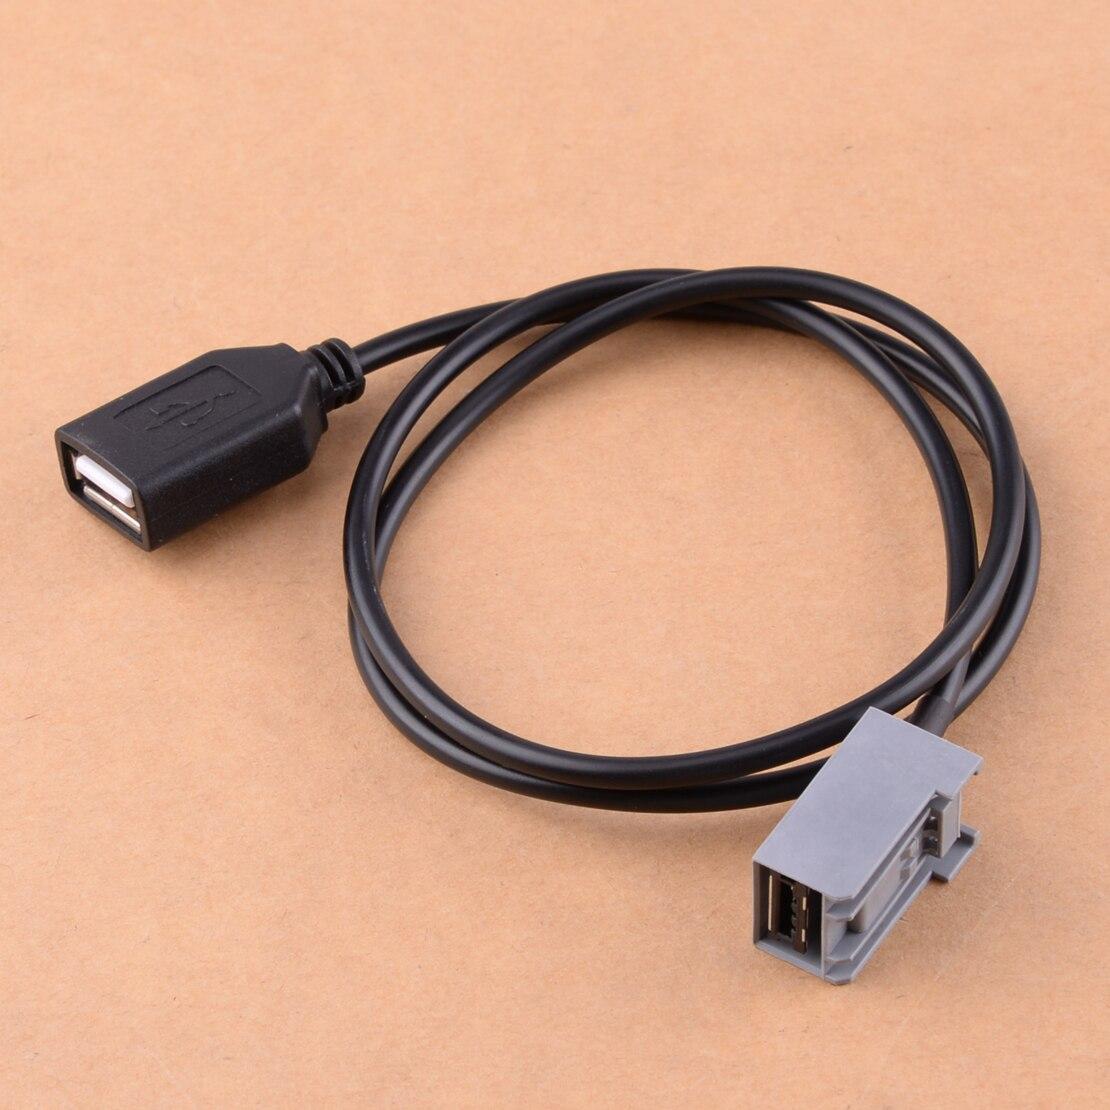 Adaptador de Cable hembra USB para coche, adaptador de puerto auxiliar compatible con Honda Civic Jazz CR-V Accord Odyssey 2009 2010 2011 2012 2013